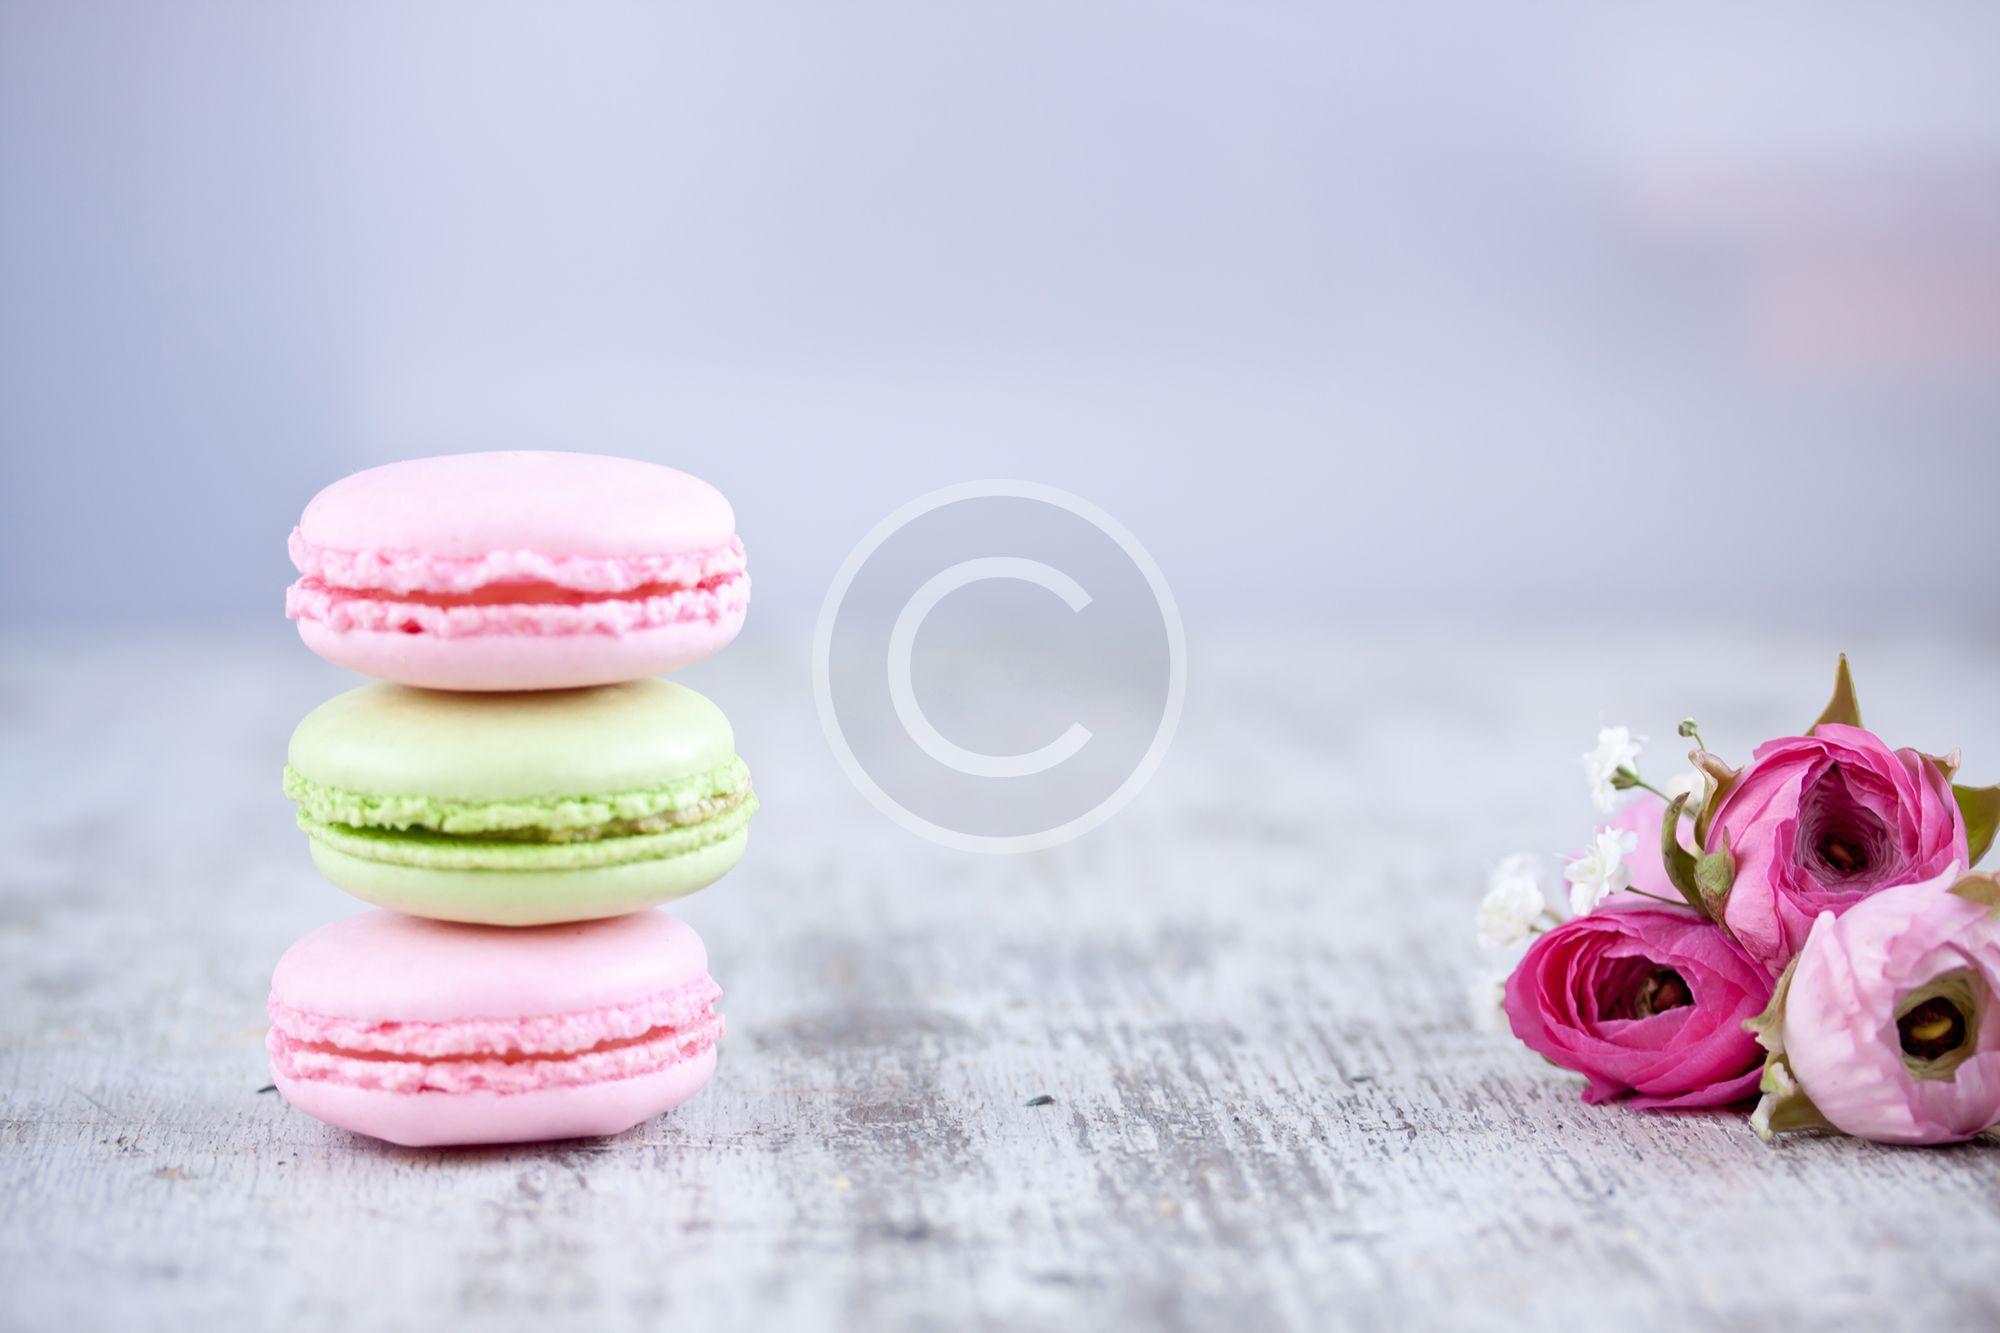 Secret of Making Perfect Macarons